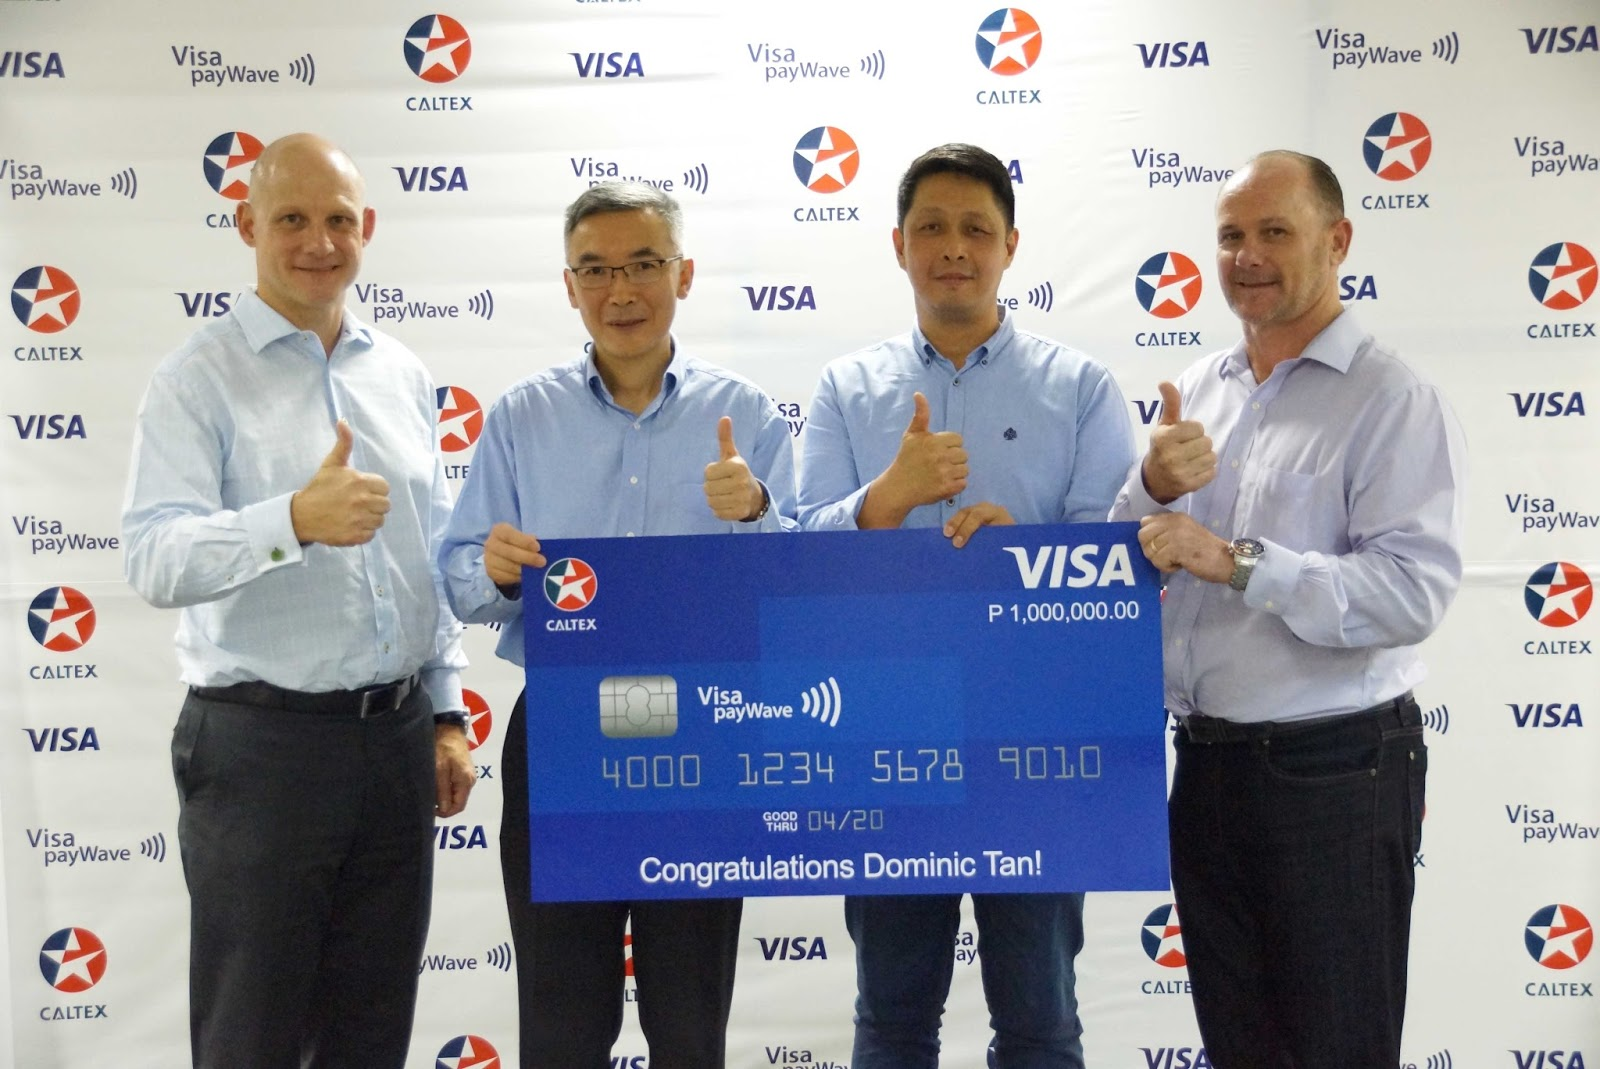 Caltex-Visa payWave Drive Away a Millionaire promo announces grand winner of P1M Visa credit